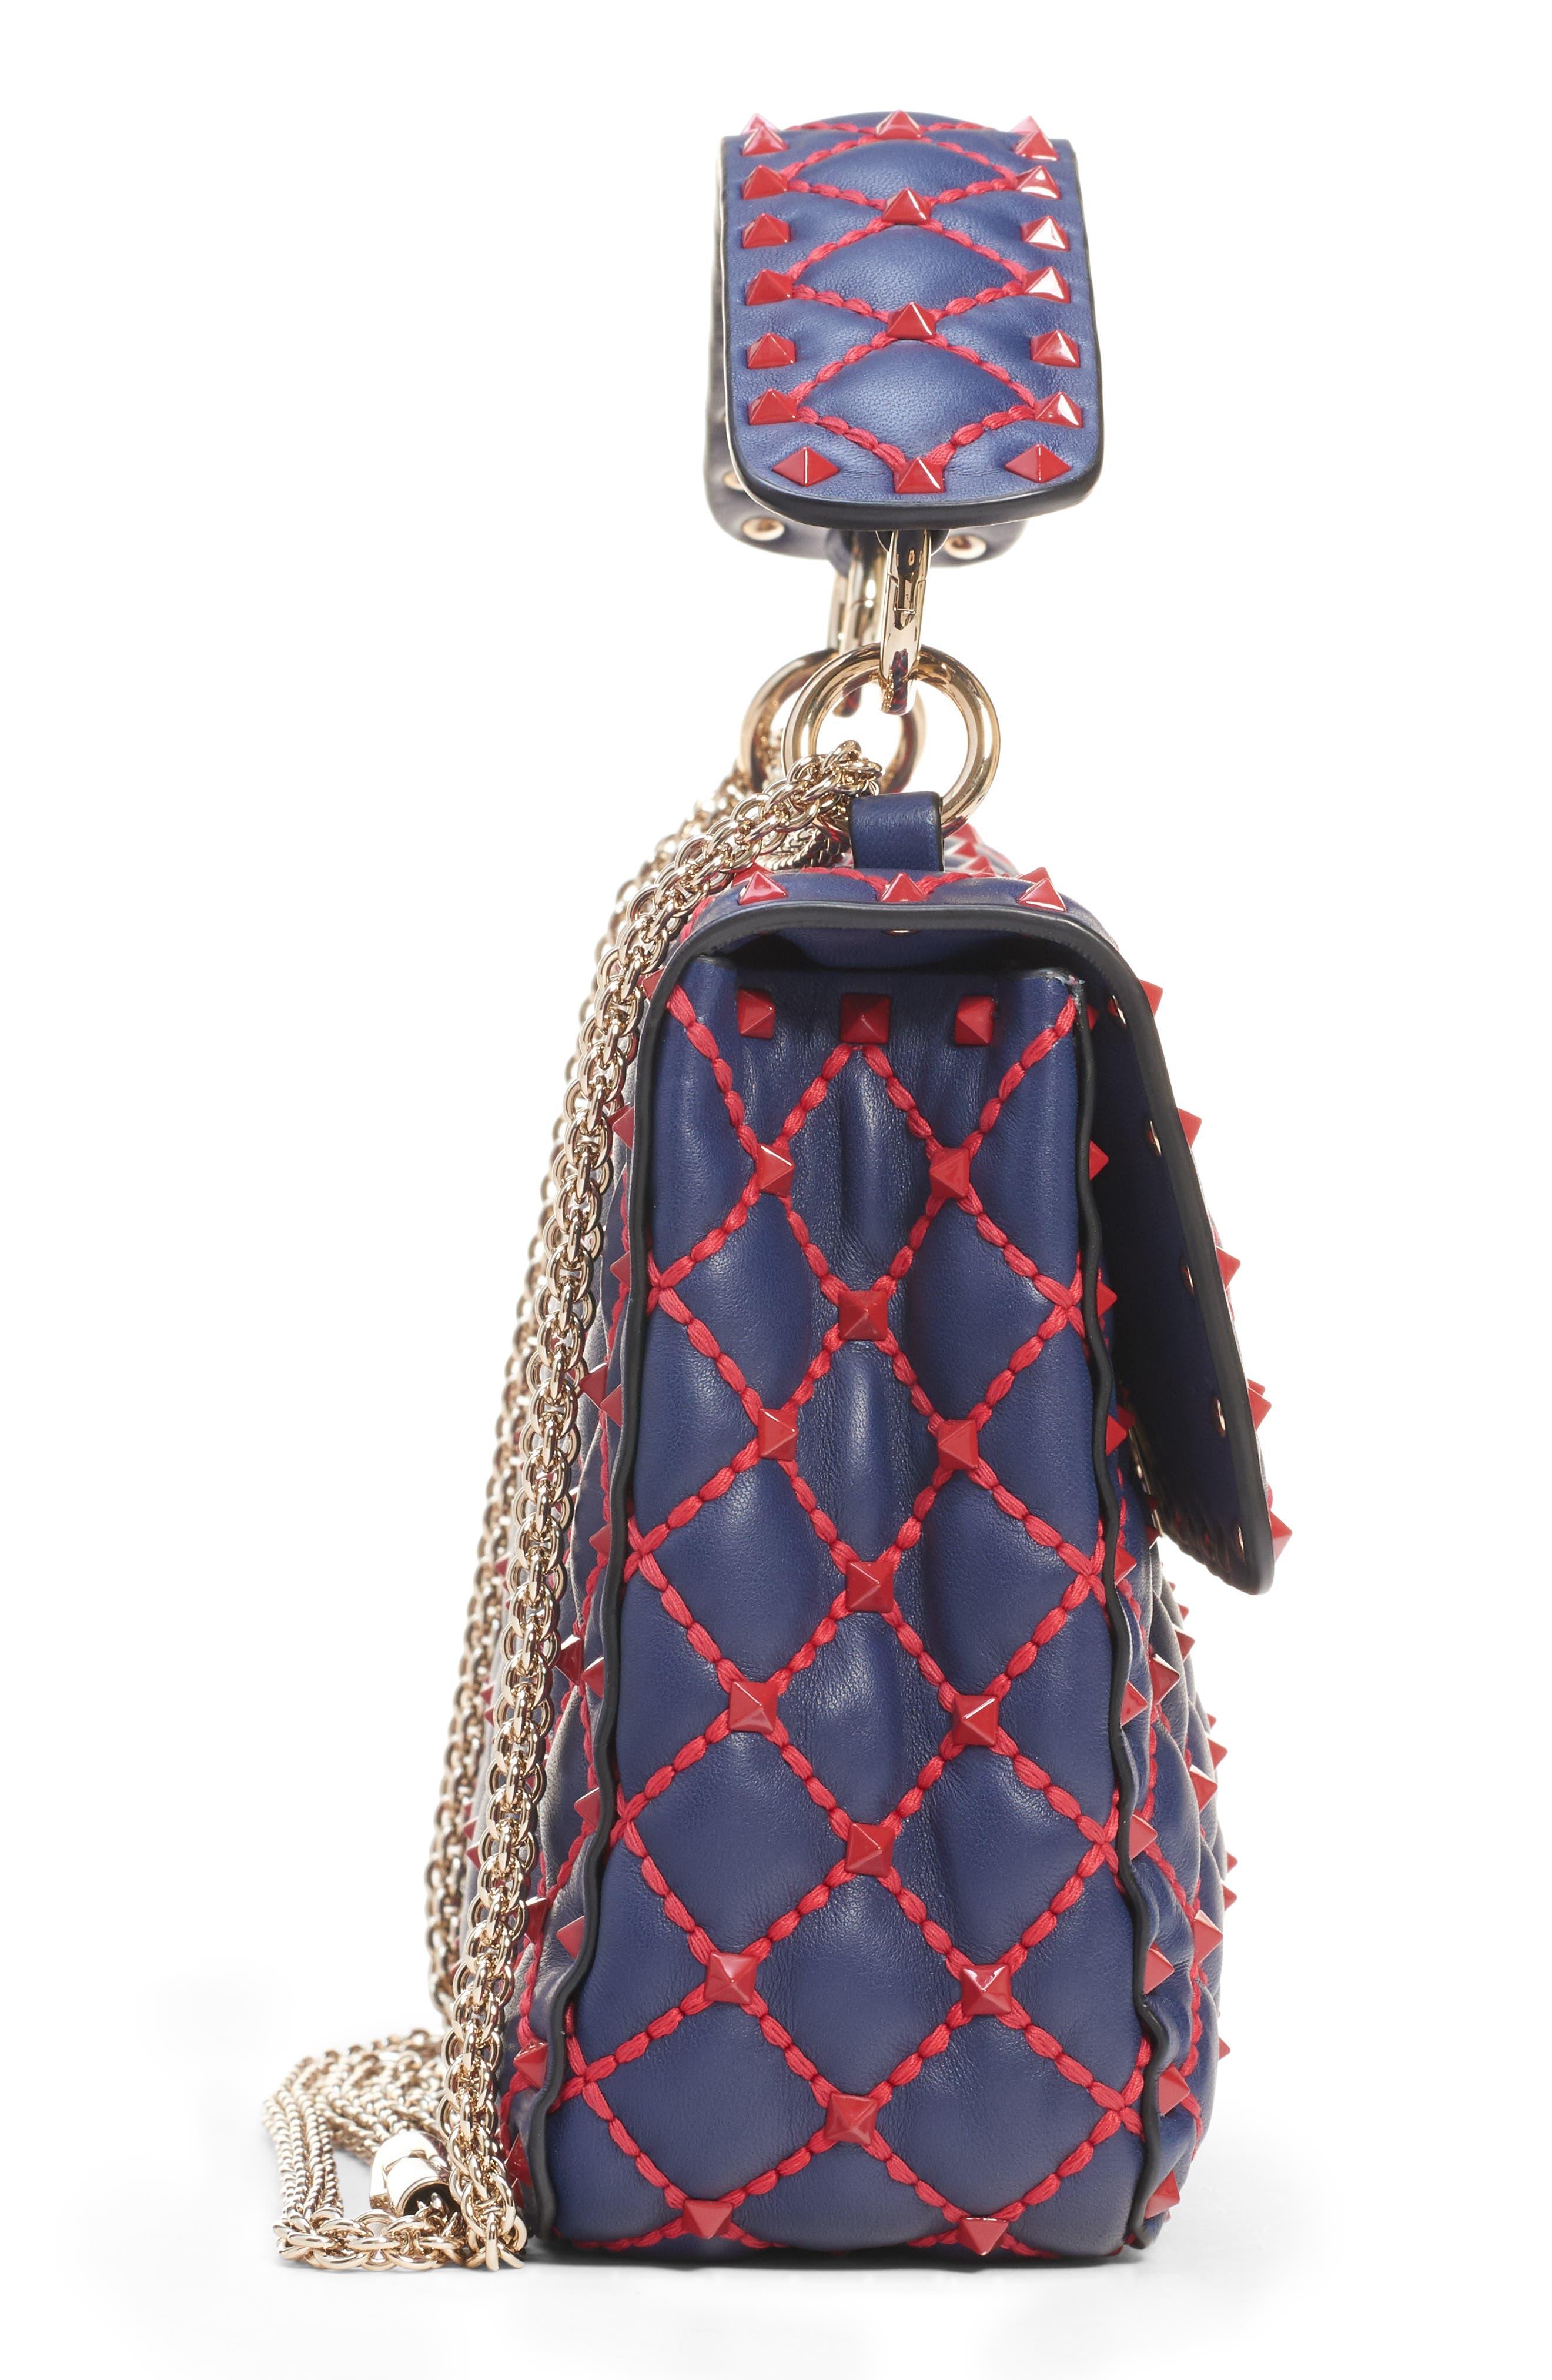 Medium Spike.It Leather Shoulder Bag,                             Alternate thumbnail 4, color,                             PURE BLUE/ ROSSO